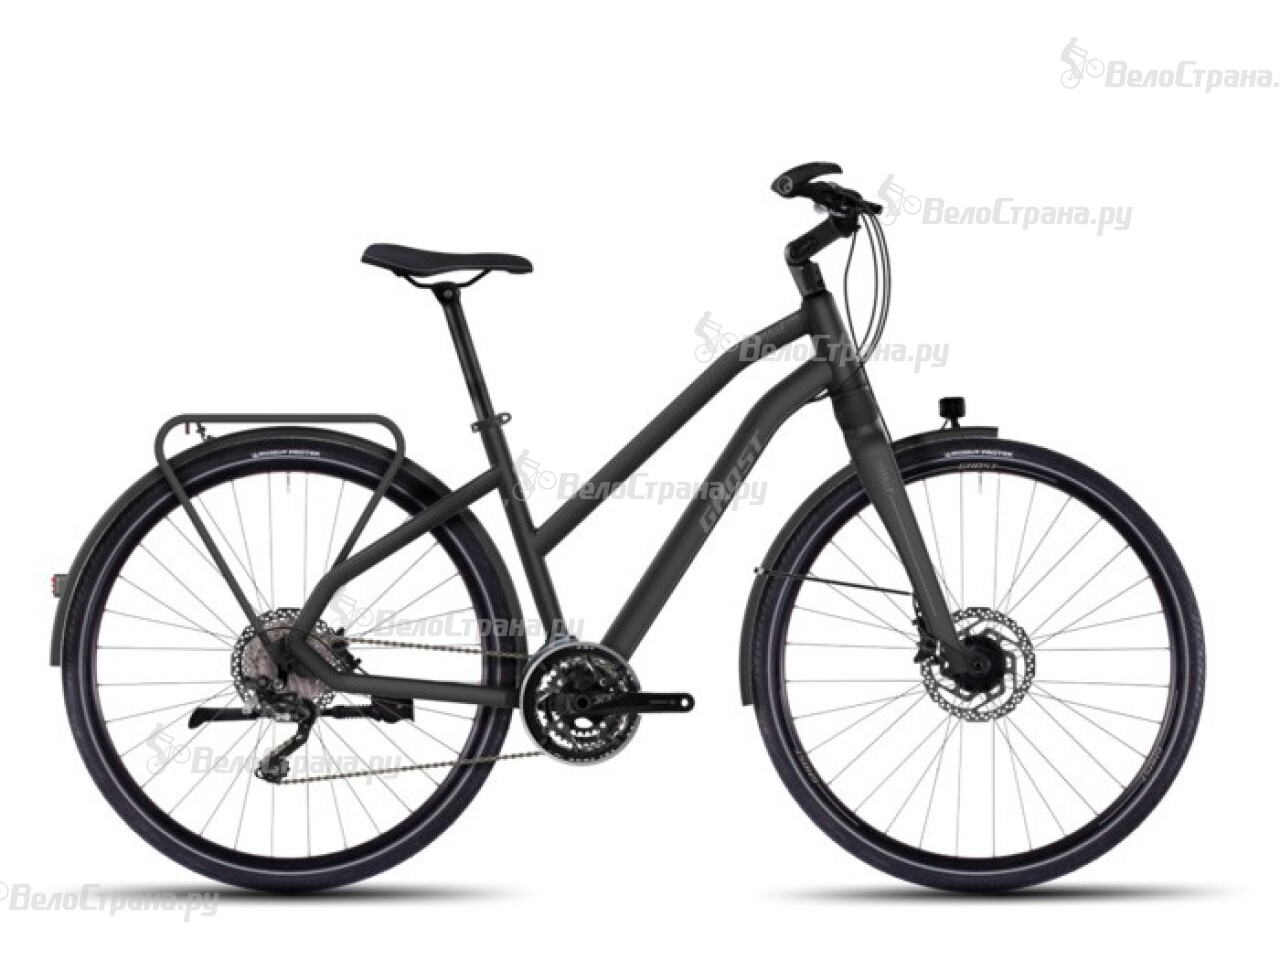 Велосипед Ghost SQUARE Trekking 8 Miss (2016) оборудование для мониторинга m square tpu page 8